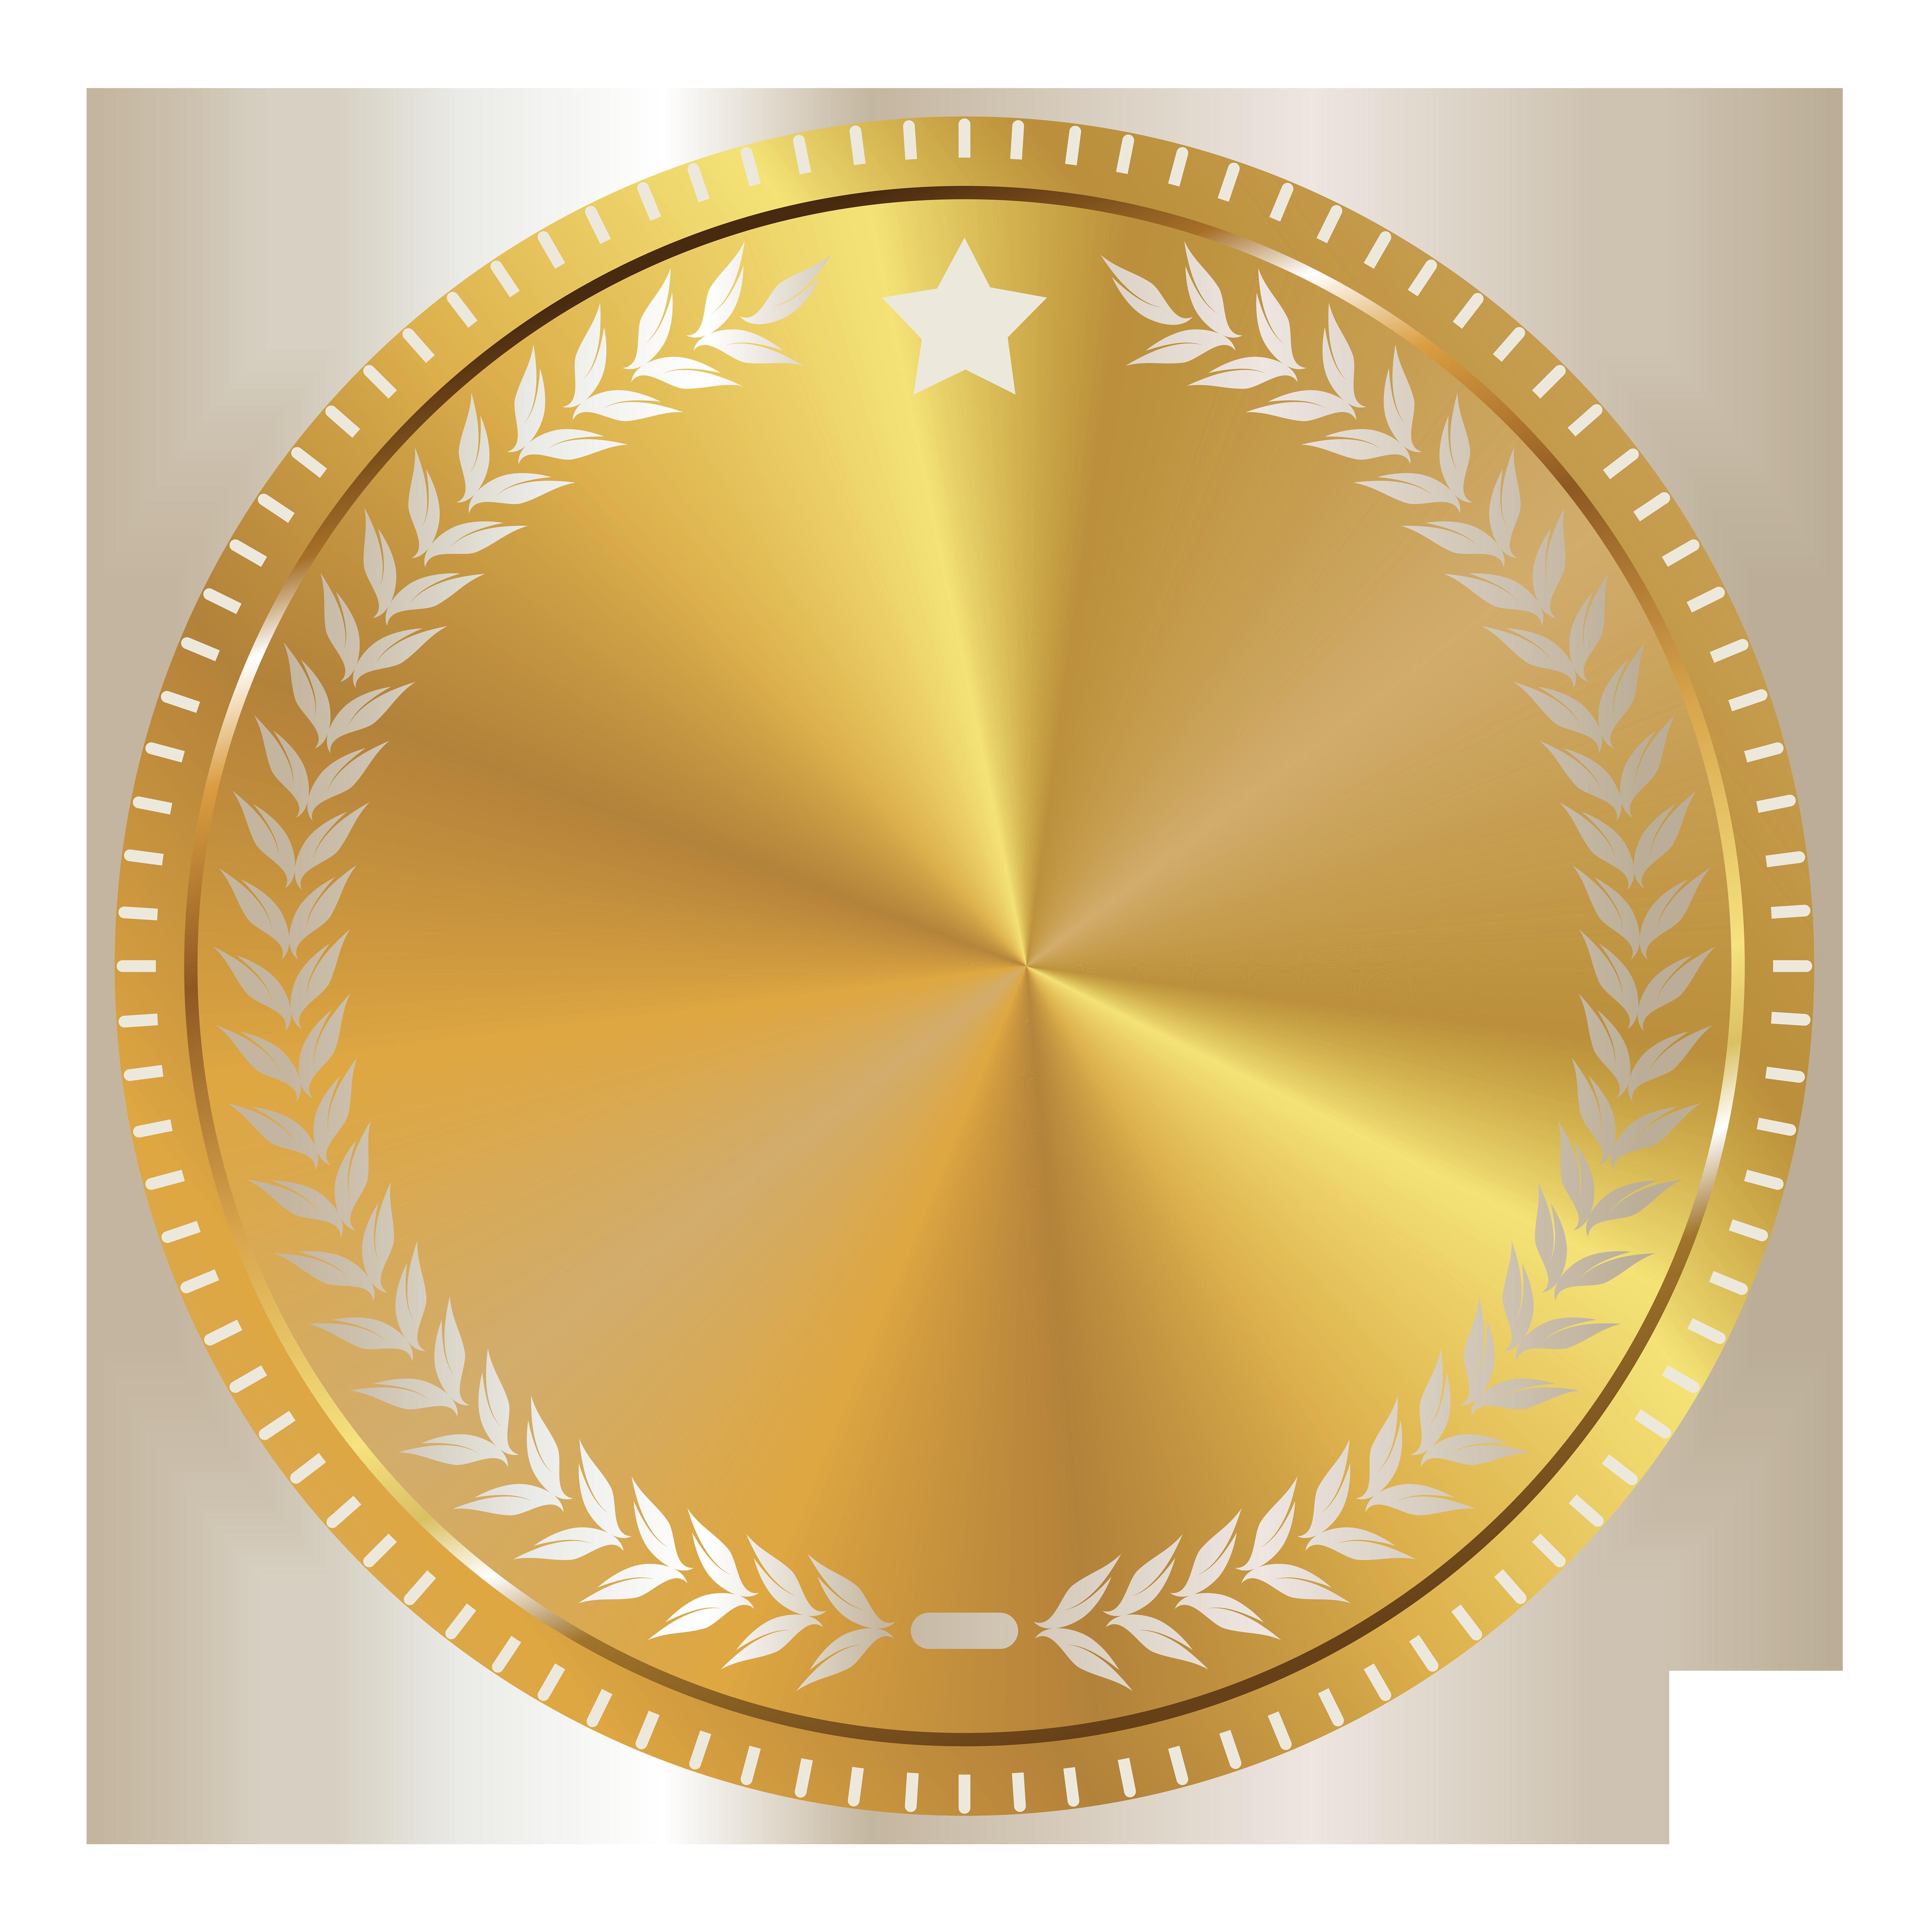 Free Award Seal Png, Download Free Clip Art, Free Clip Art.